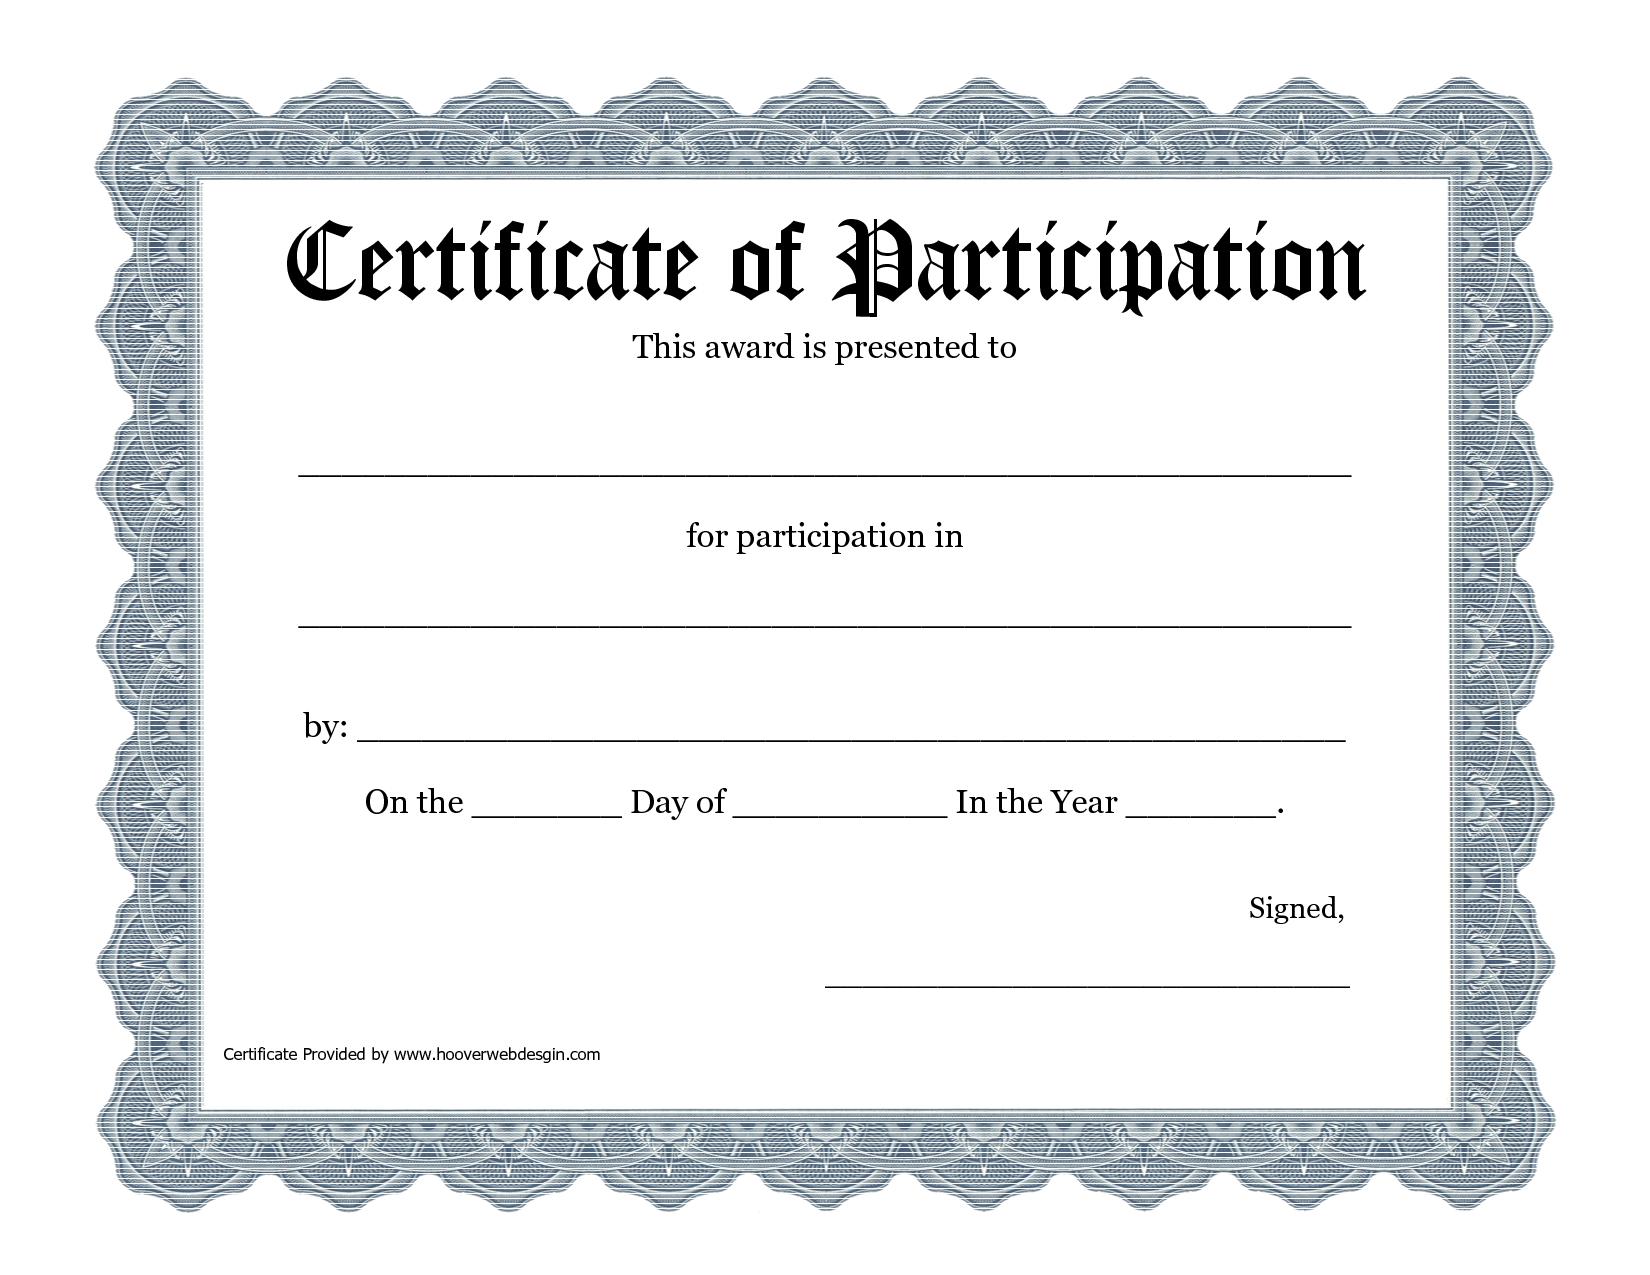 Free Printable Award Certificate Template - Bing Images   2016 Art - Free Printable Certificate Templates